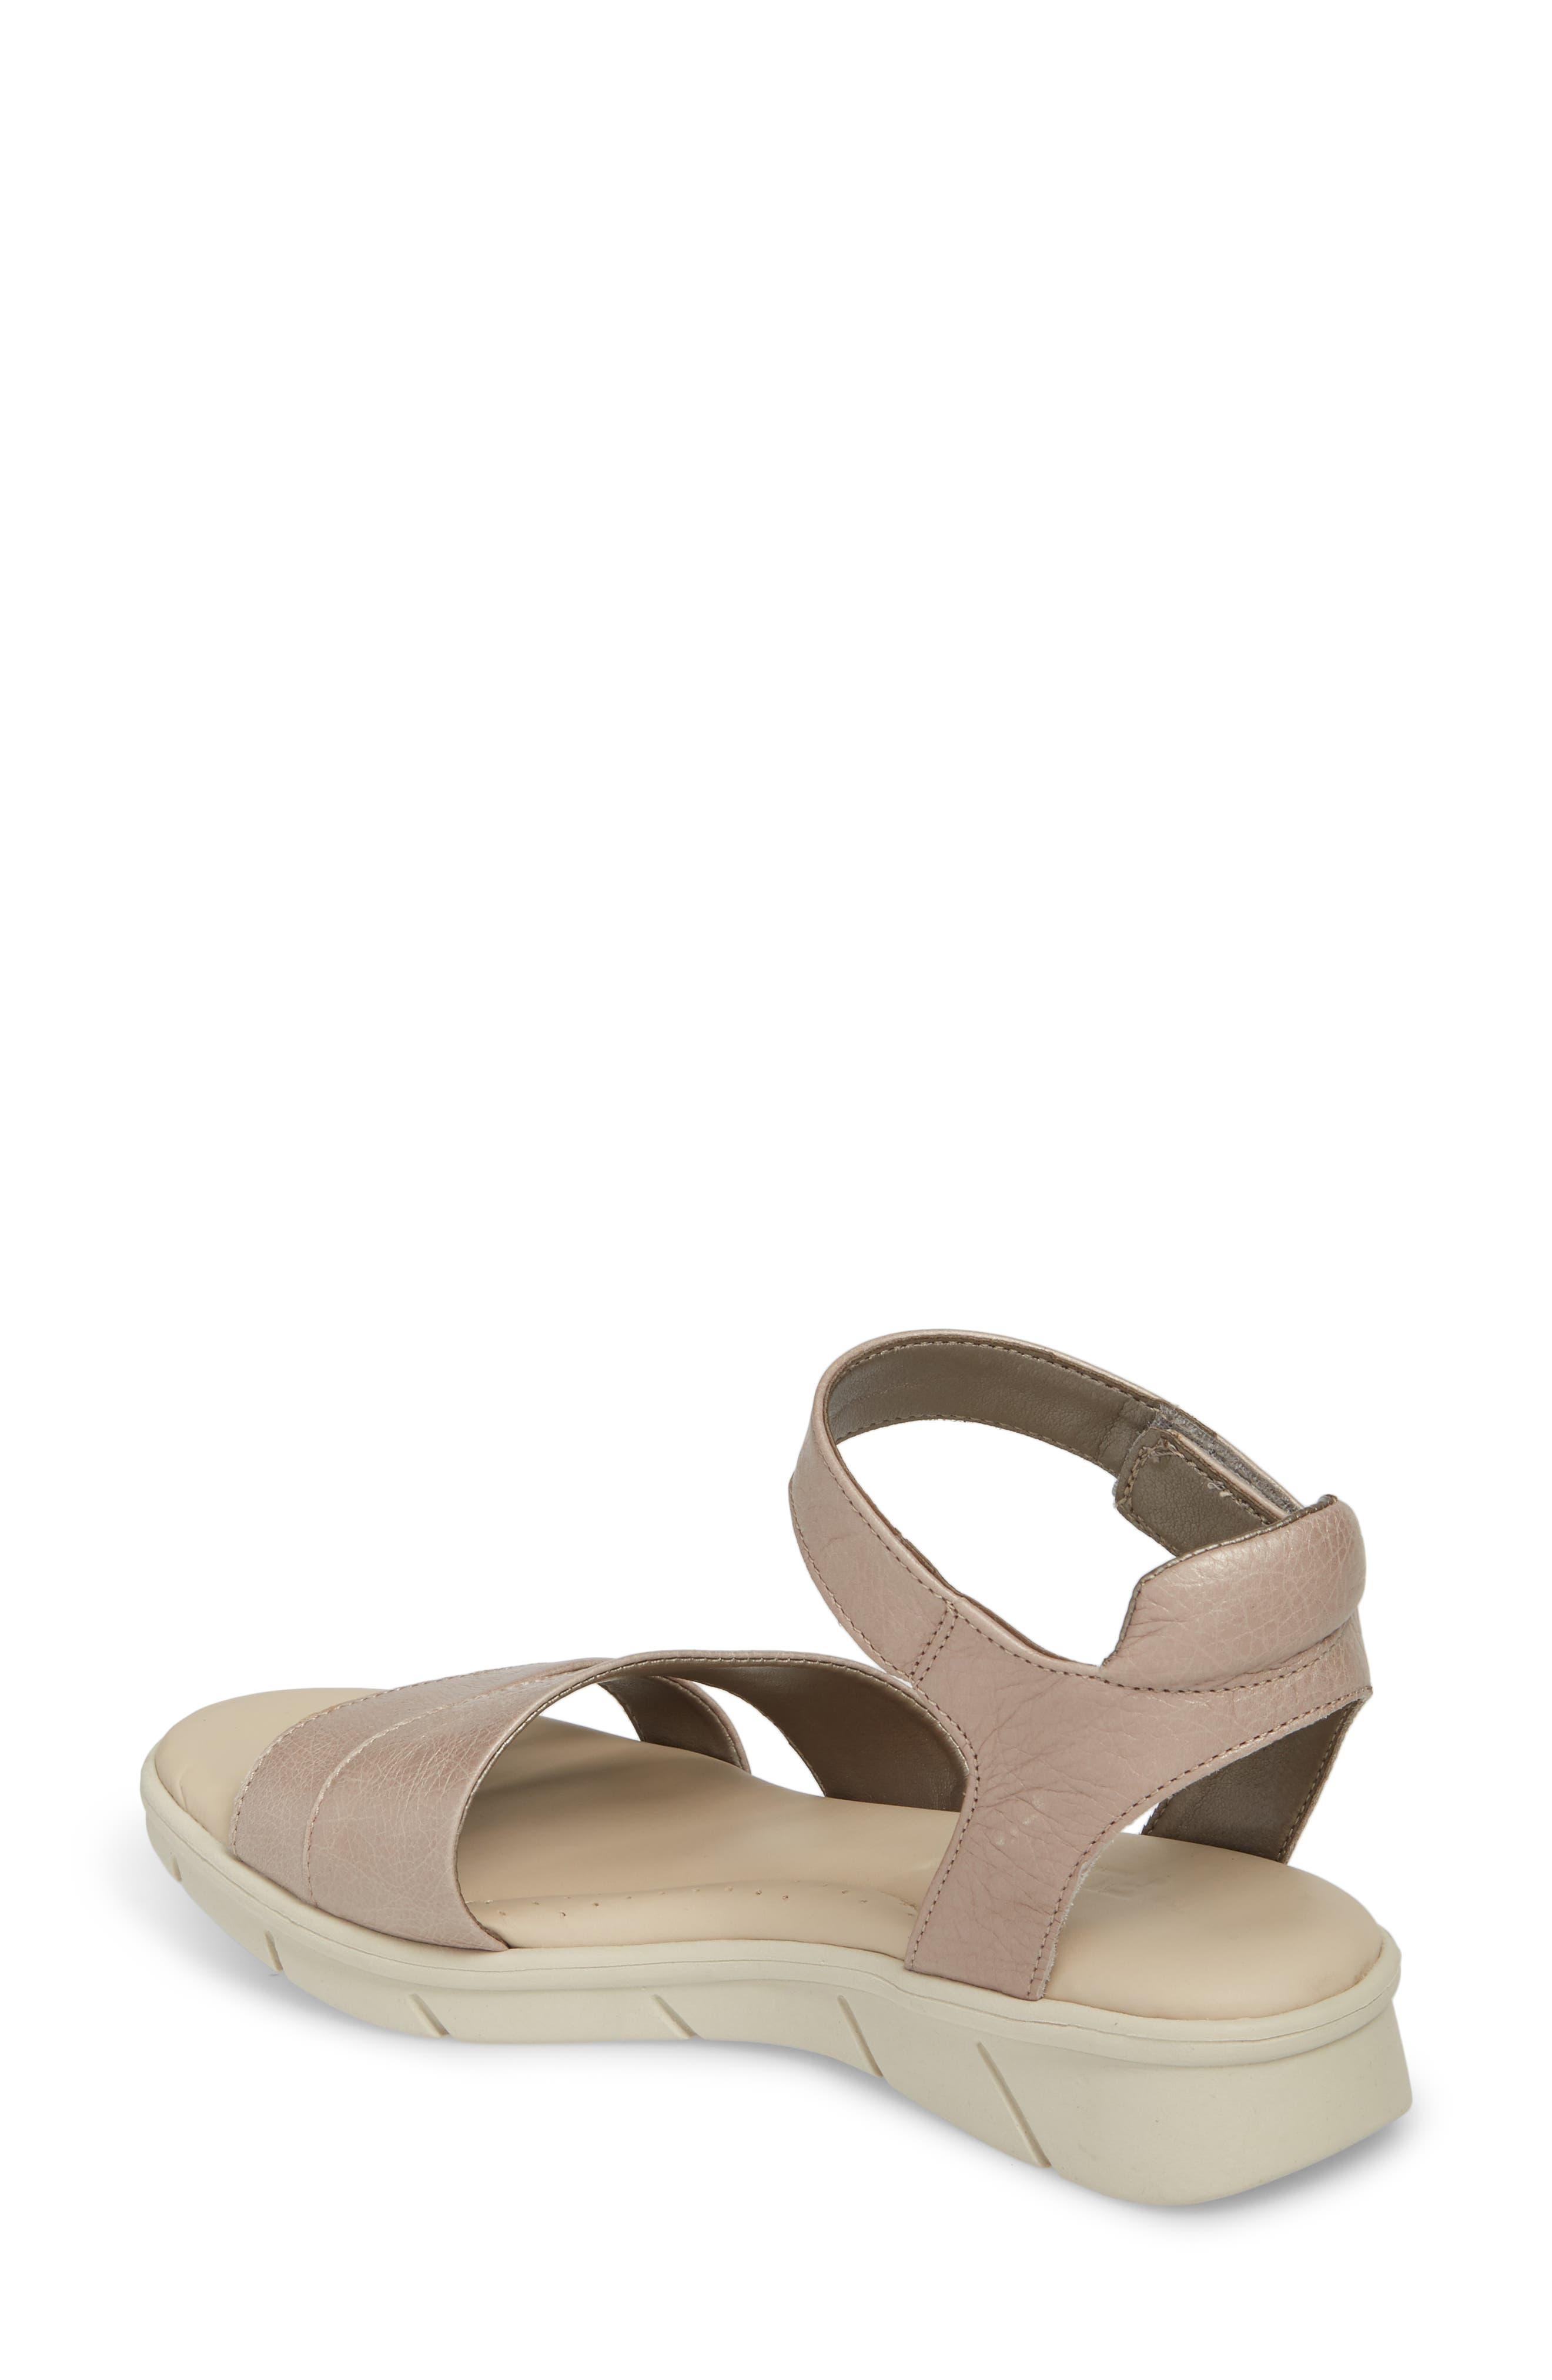 Crossover Ankle Strap Sandal,                             Alternate thumbnail 2, color,                             HAZE CRACKLED LEATHER